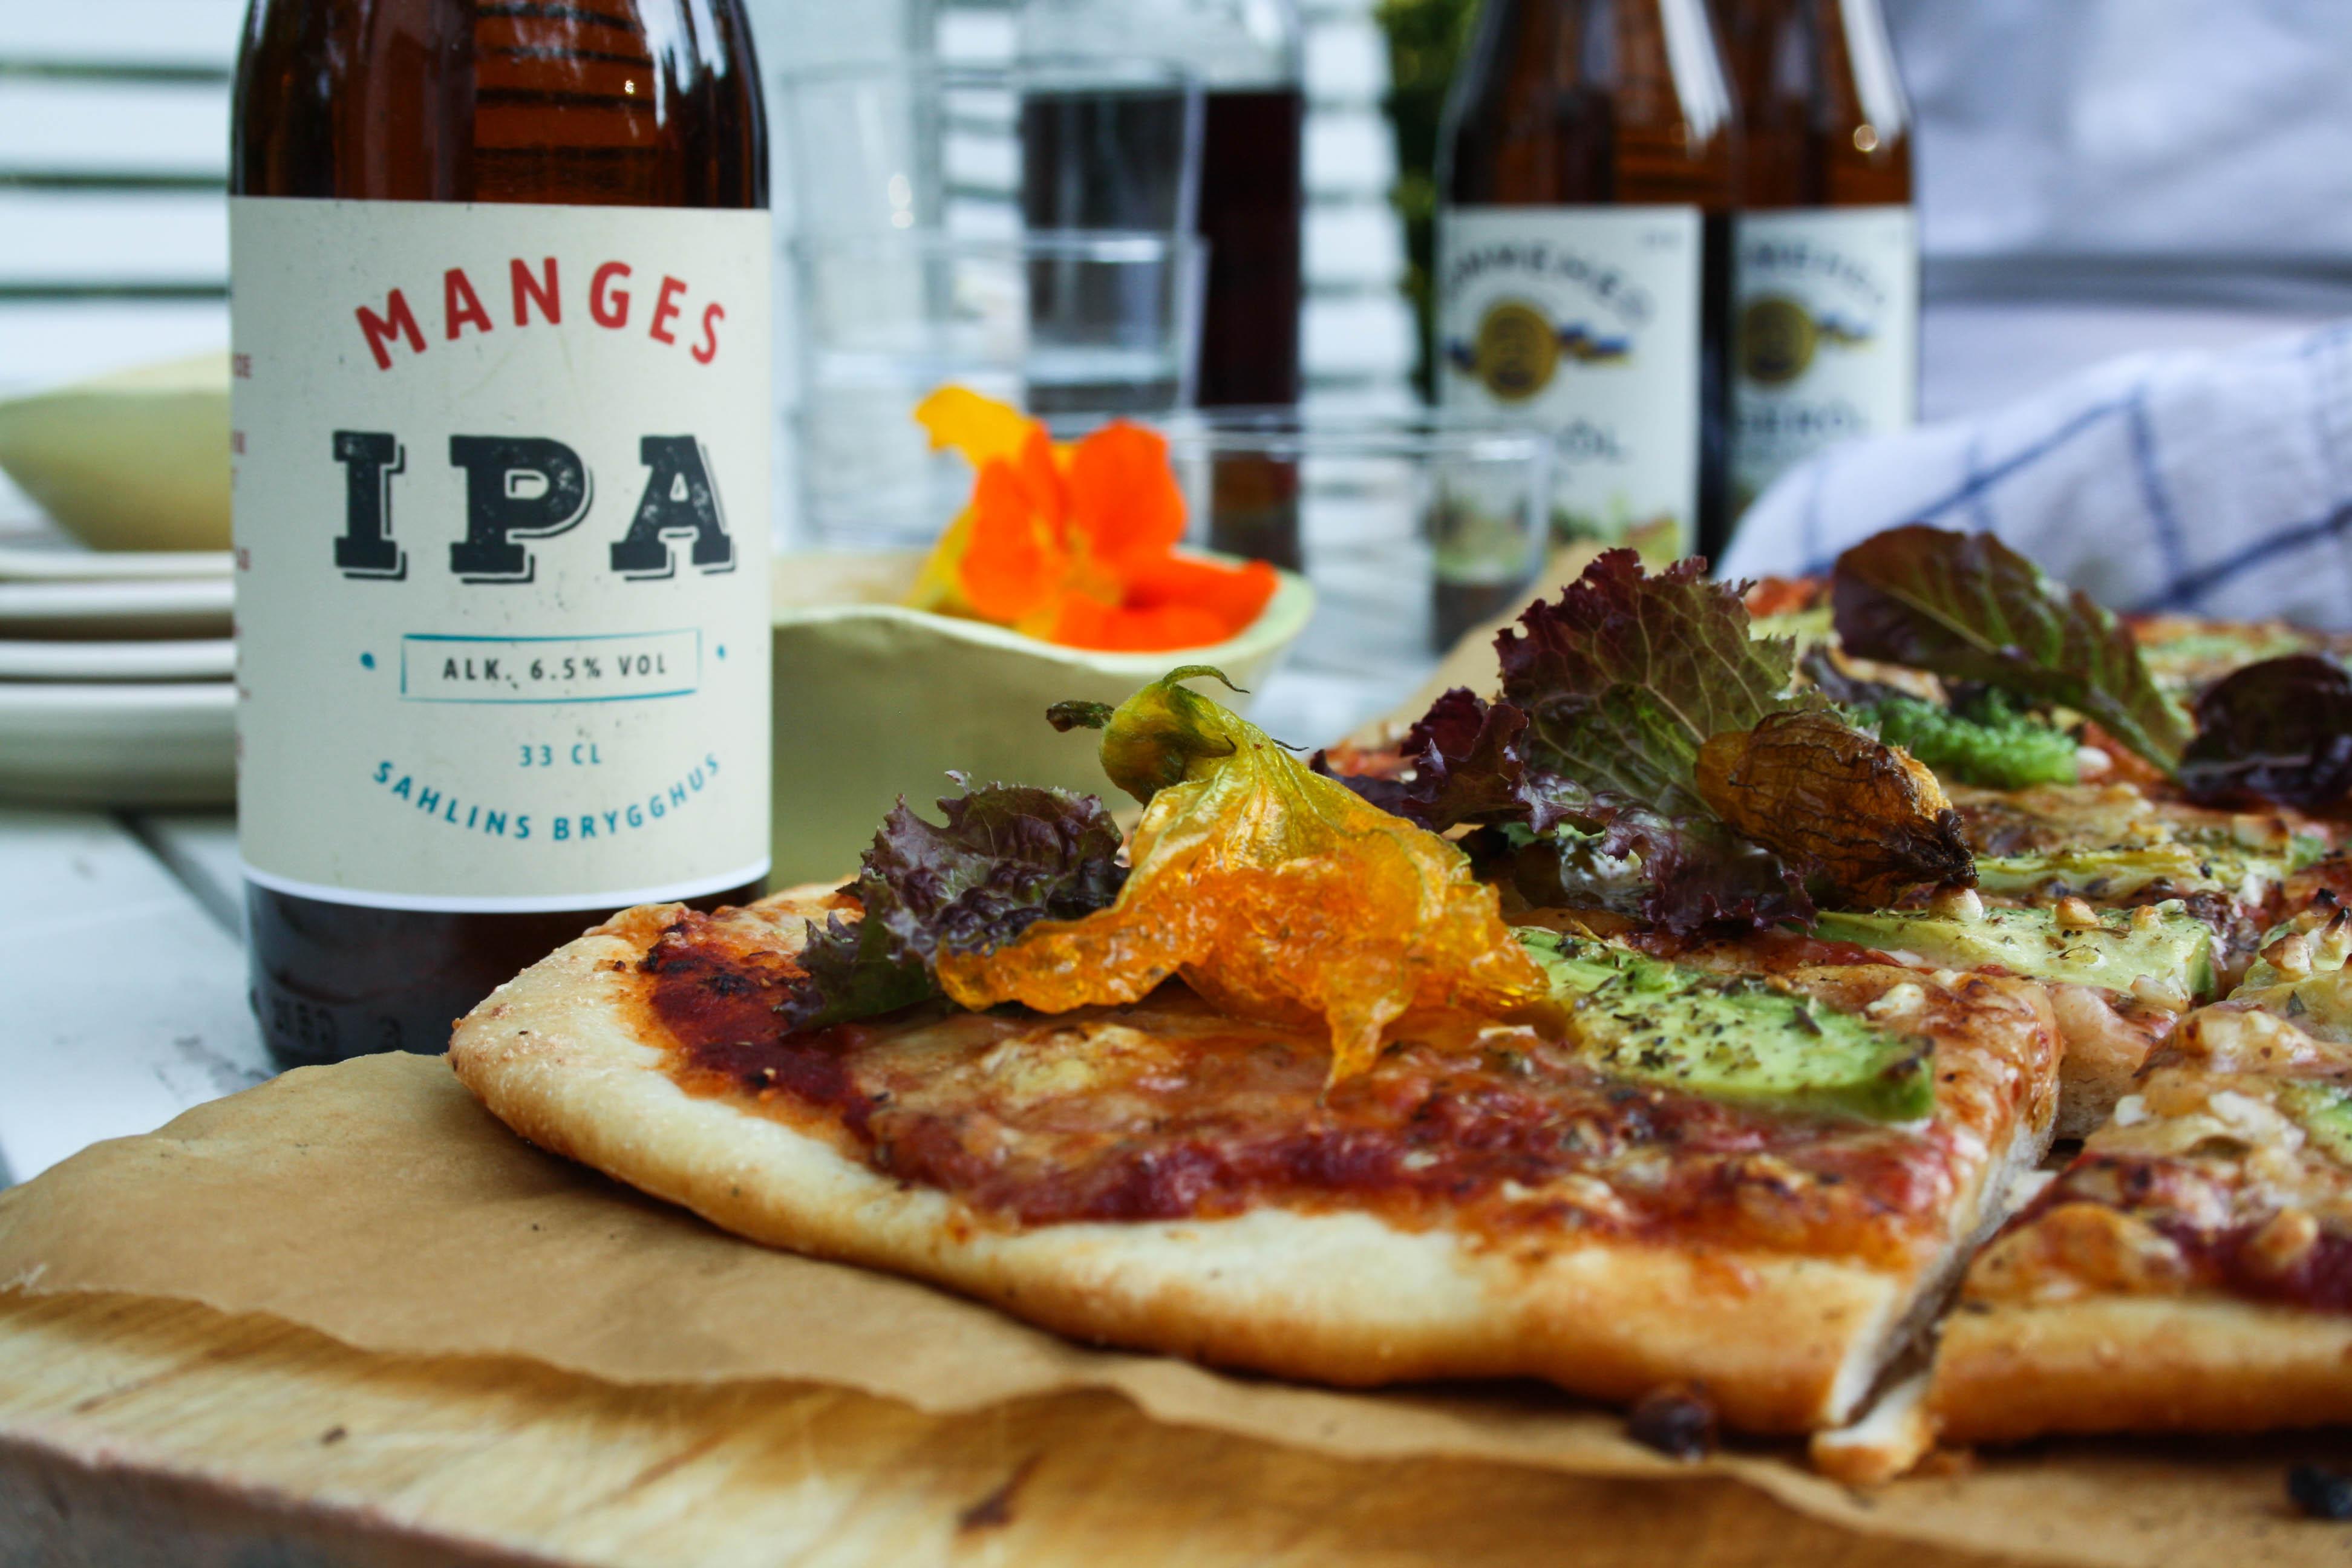 Sahlins brygghus, strutsar, god öl & avokadopizza